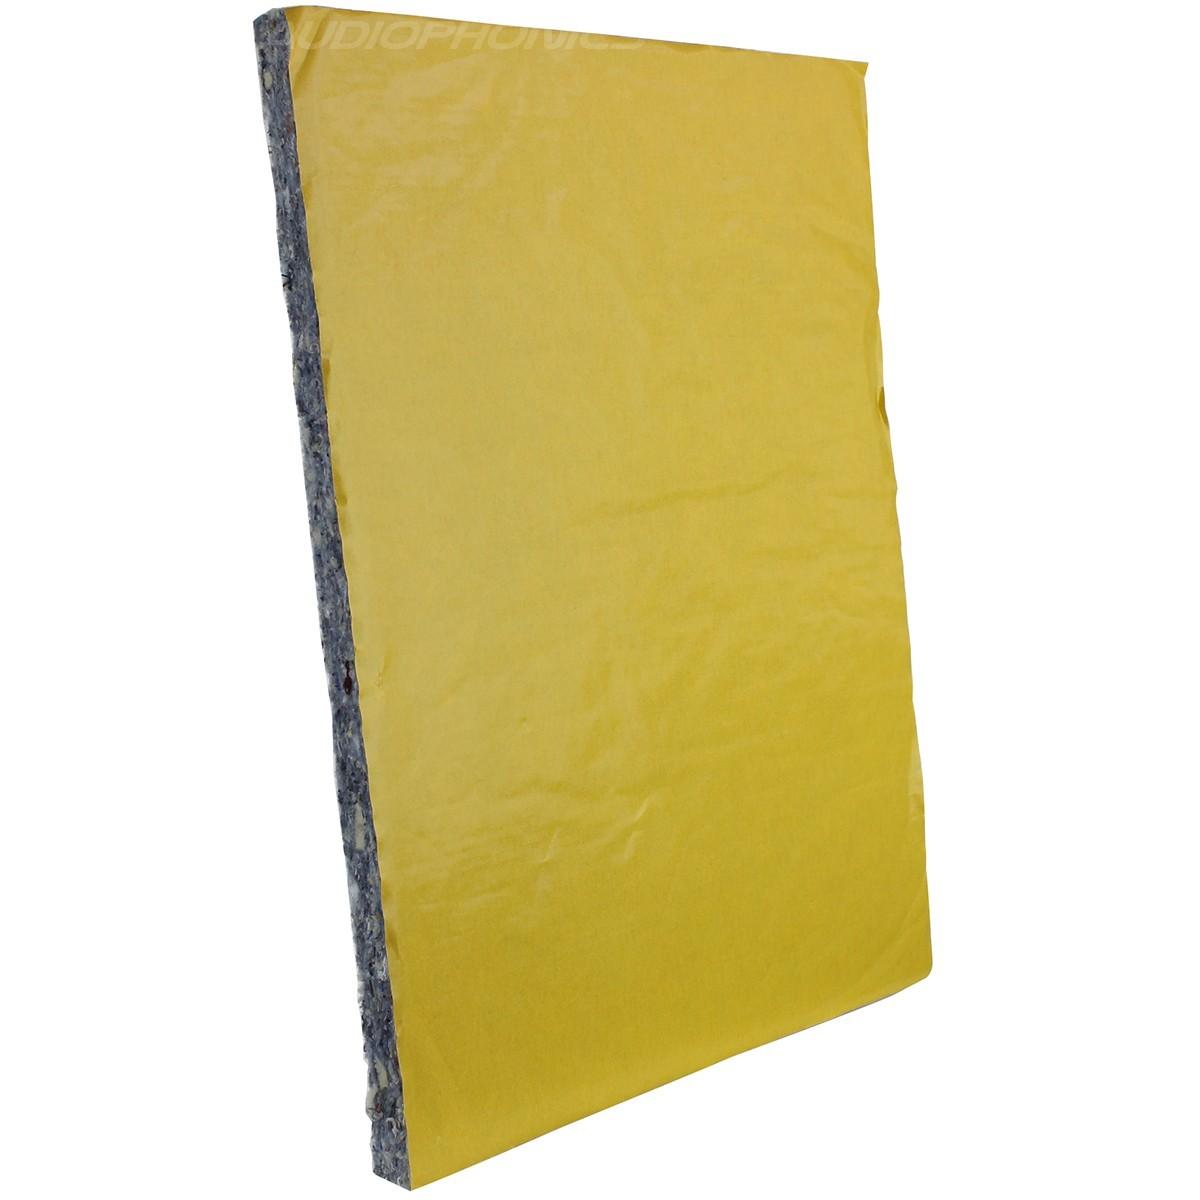 PINTA RESOBSON FU1220 Self-Adhesive Fabric Felt Damping 400x500mm